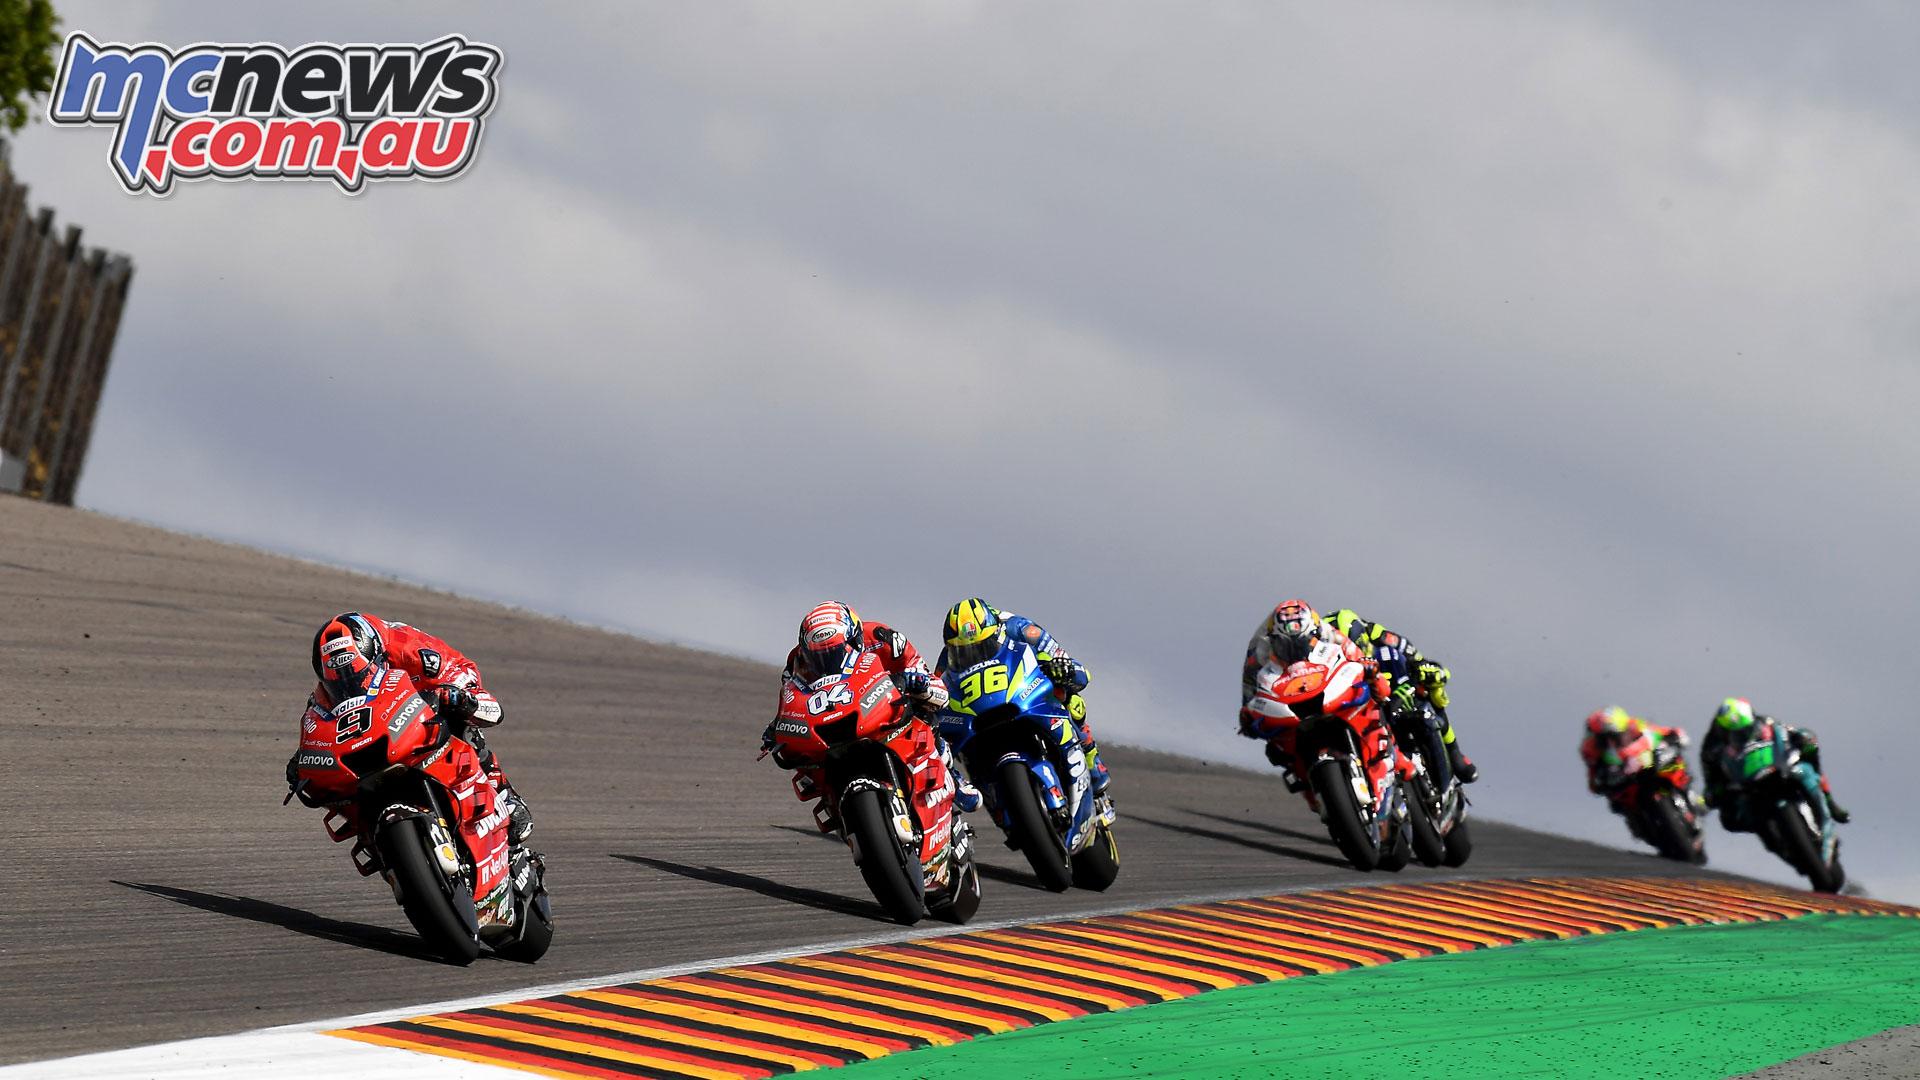 MotoGP Rnd Sachsenring Germany Petrucci Dovi